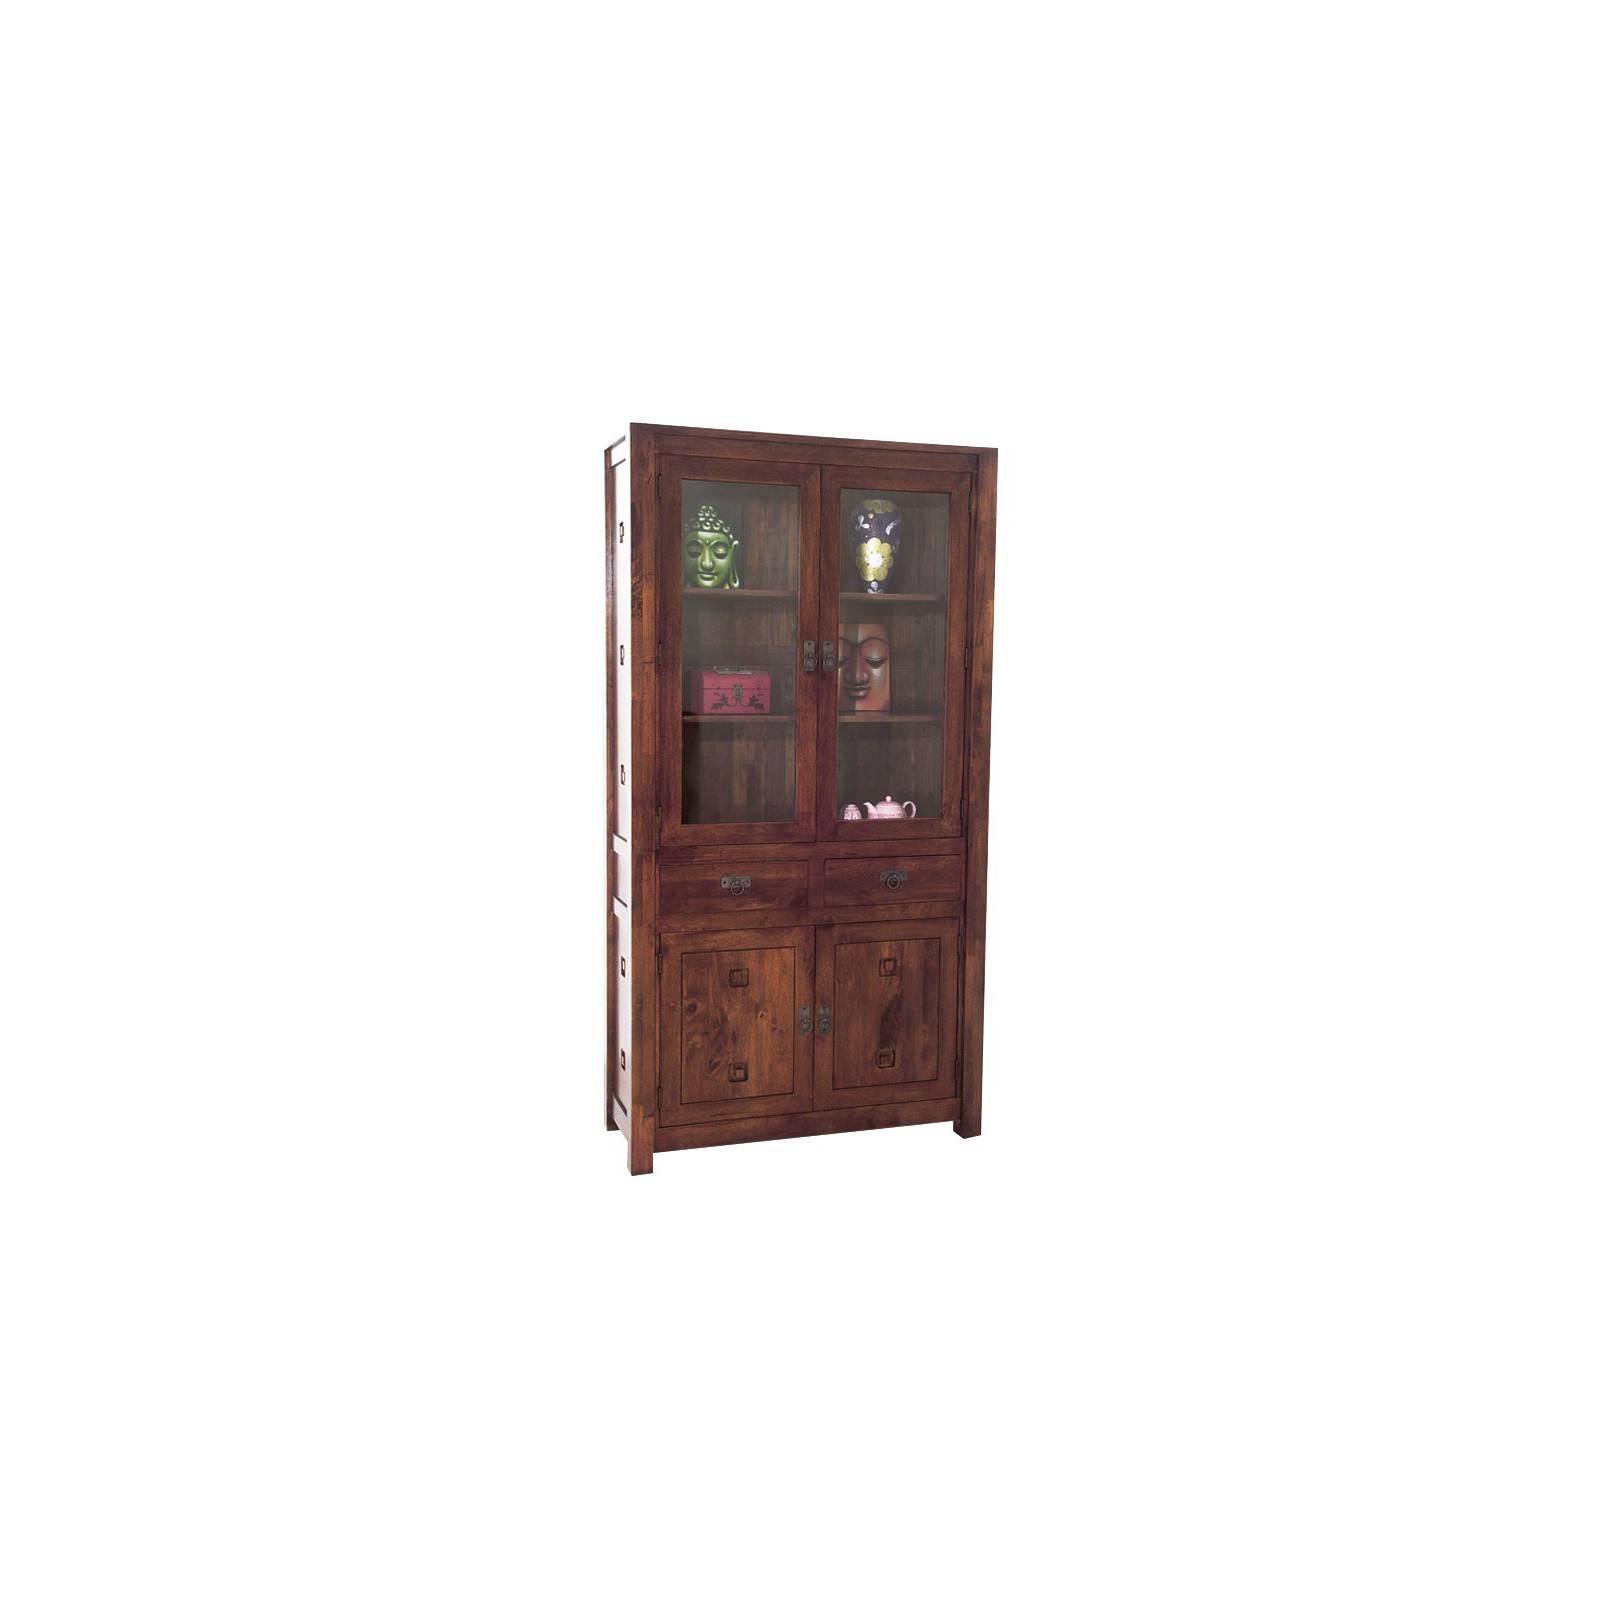 Vitrine Tanoa Hévéa - mobilier bois massif